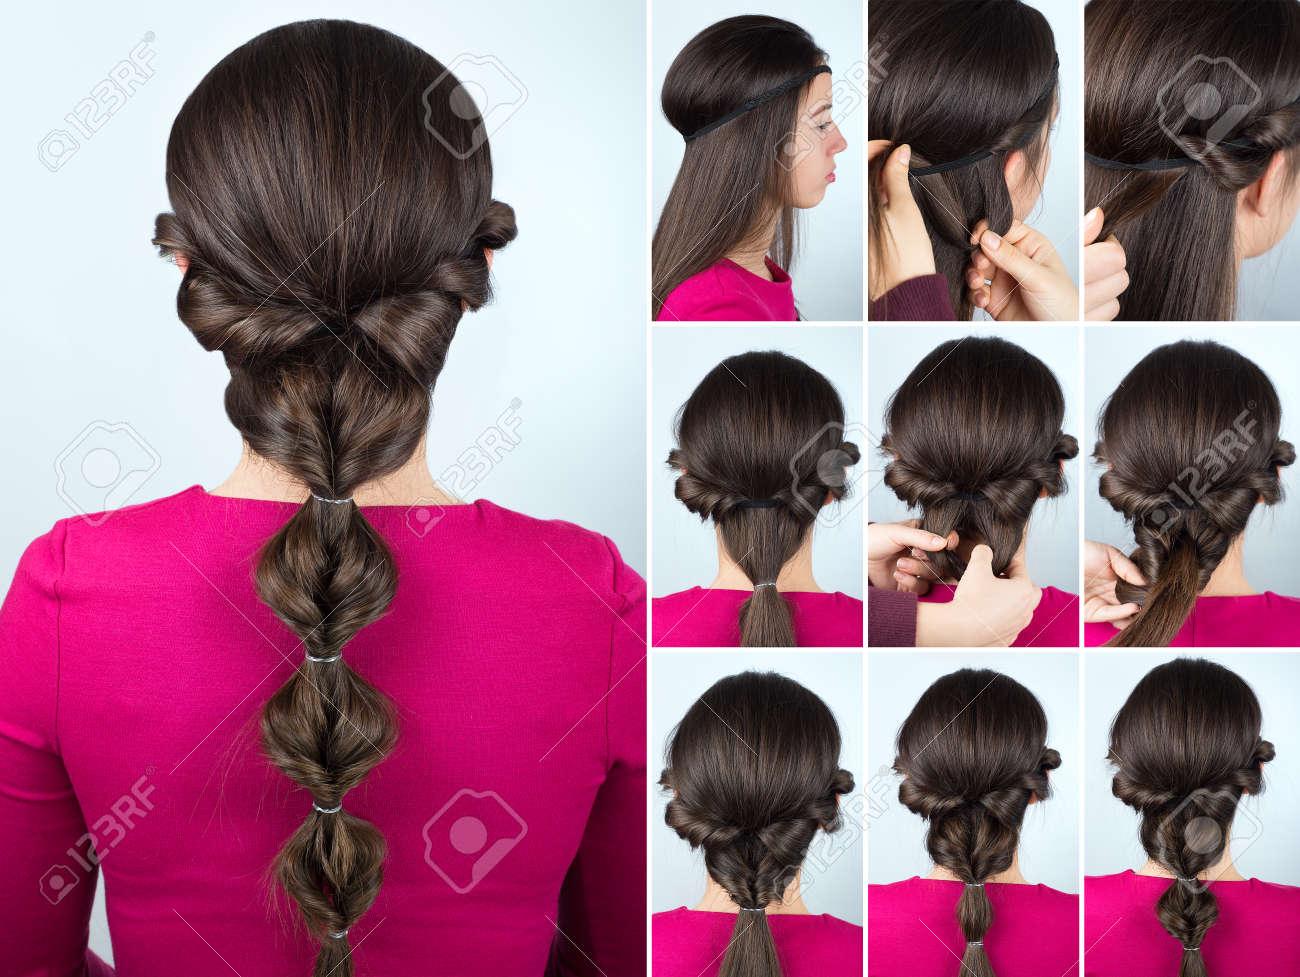 Simple Greek Hairstyle Twisted Ponytail Tutorial Hairstyle Tutorial